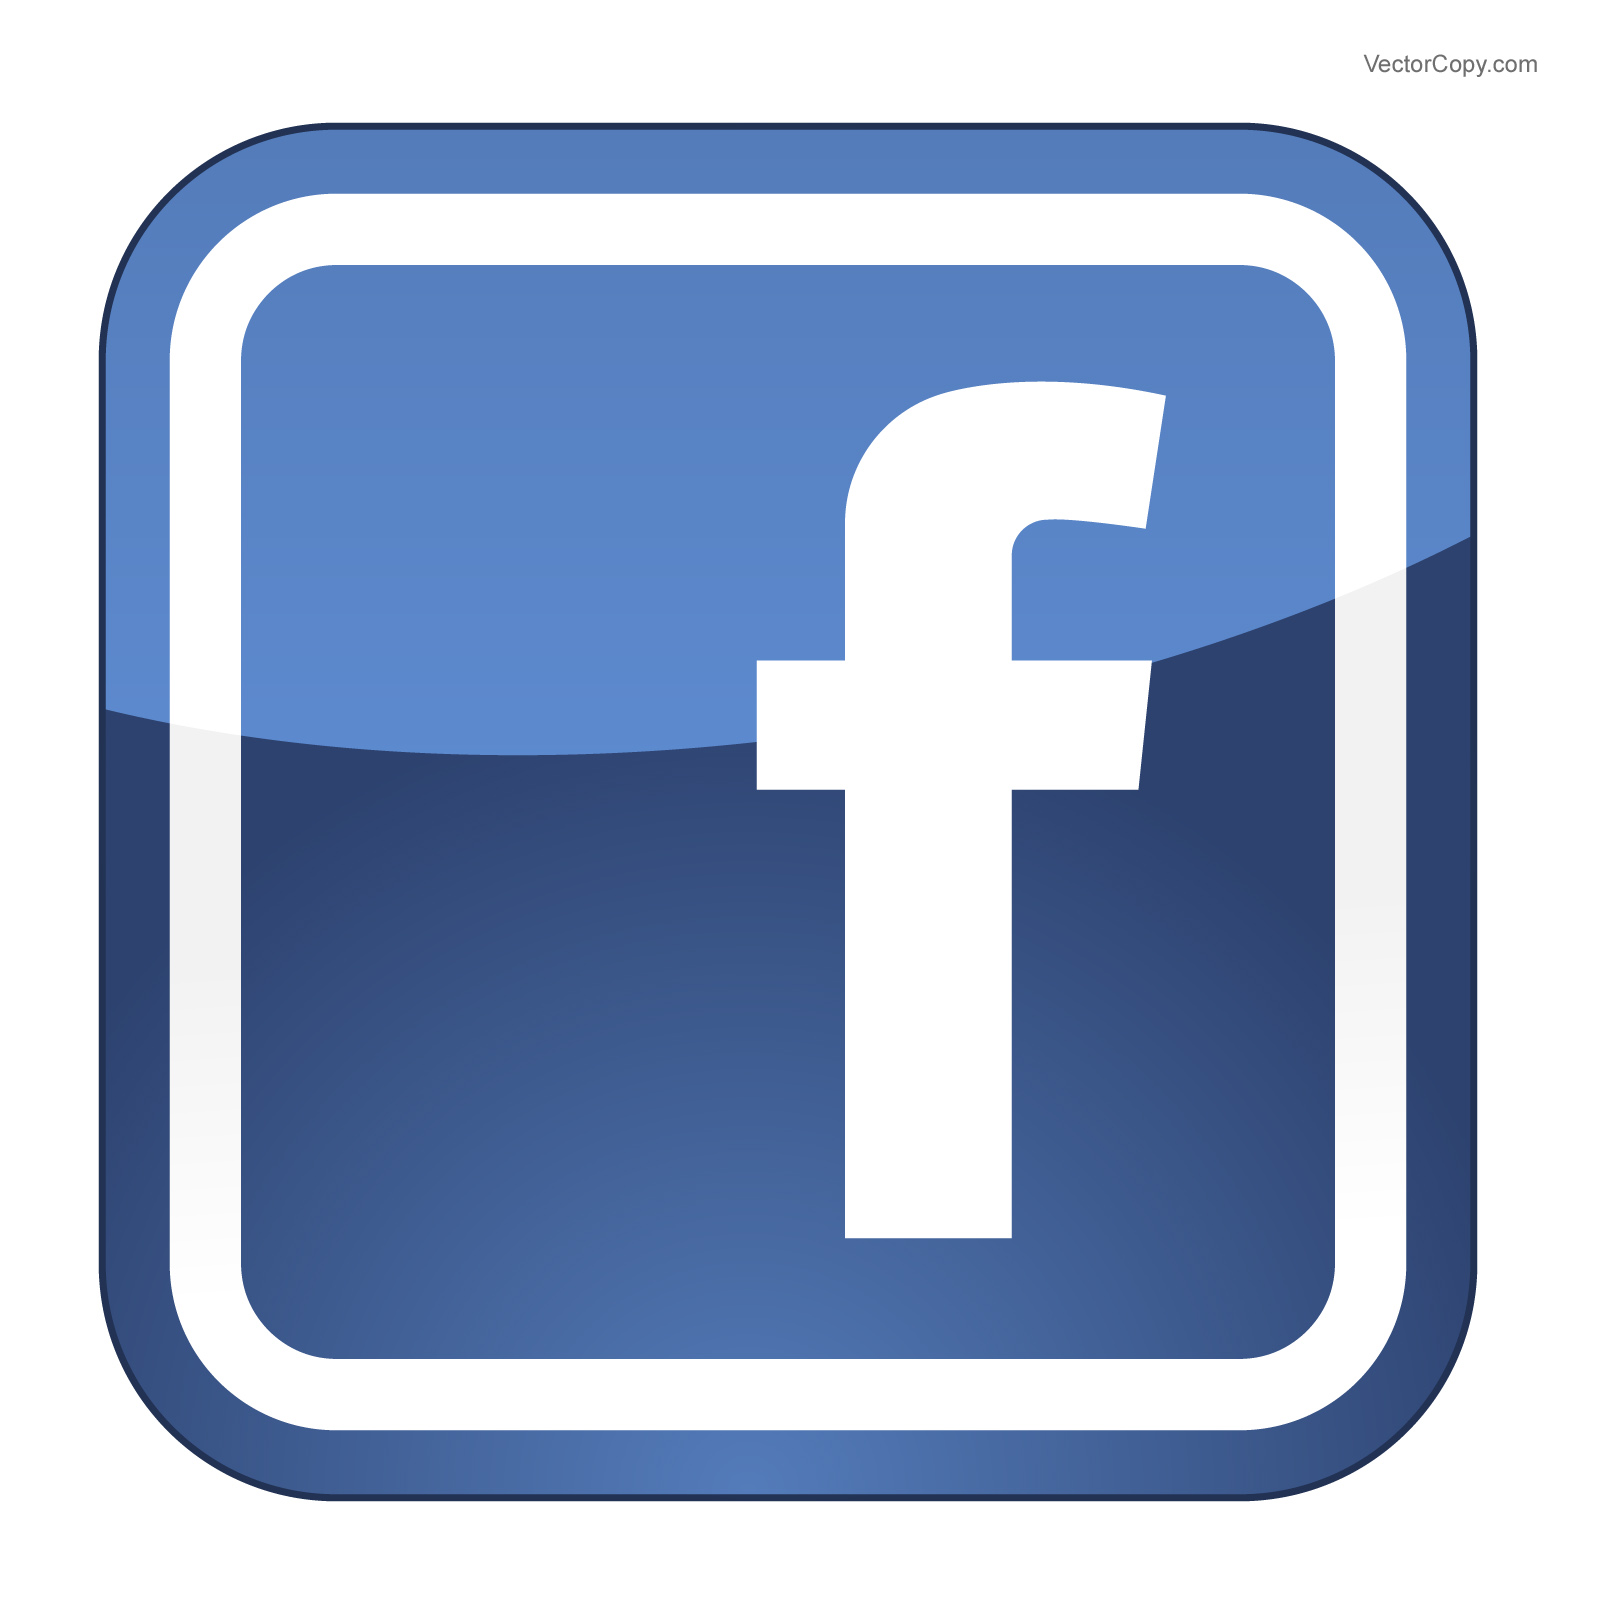 Logo de fb clipart svg royalty free Facebook twitter icon clipart clipart kid 3 - Clipartix svg royalty free